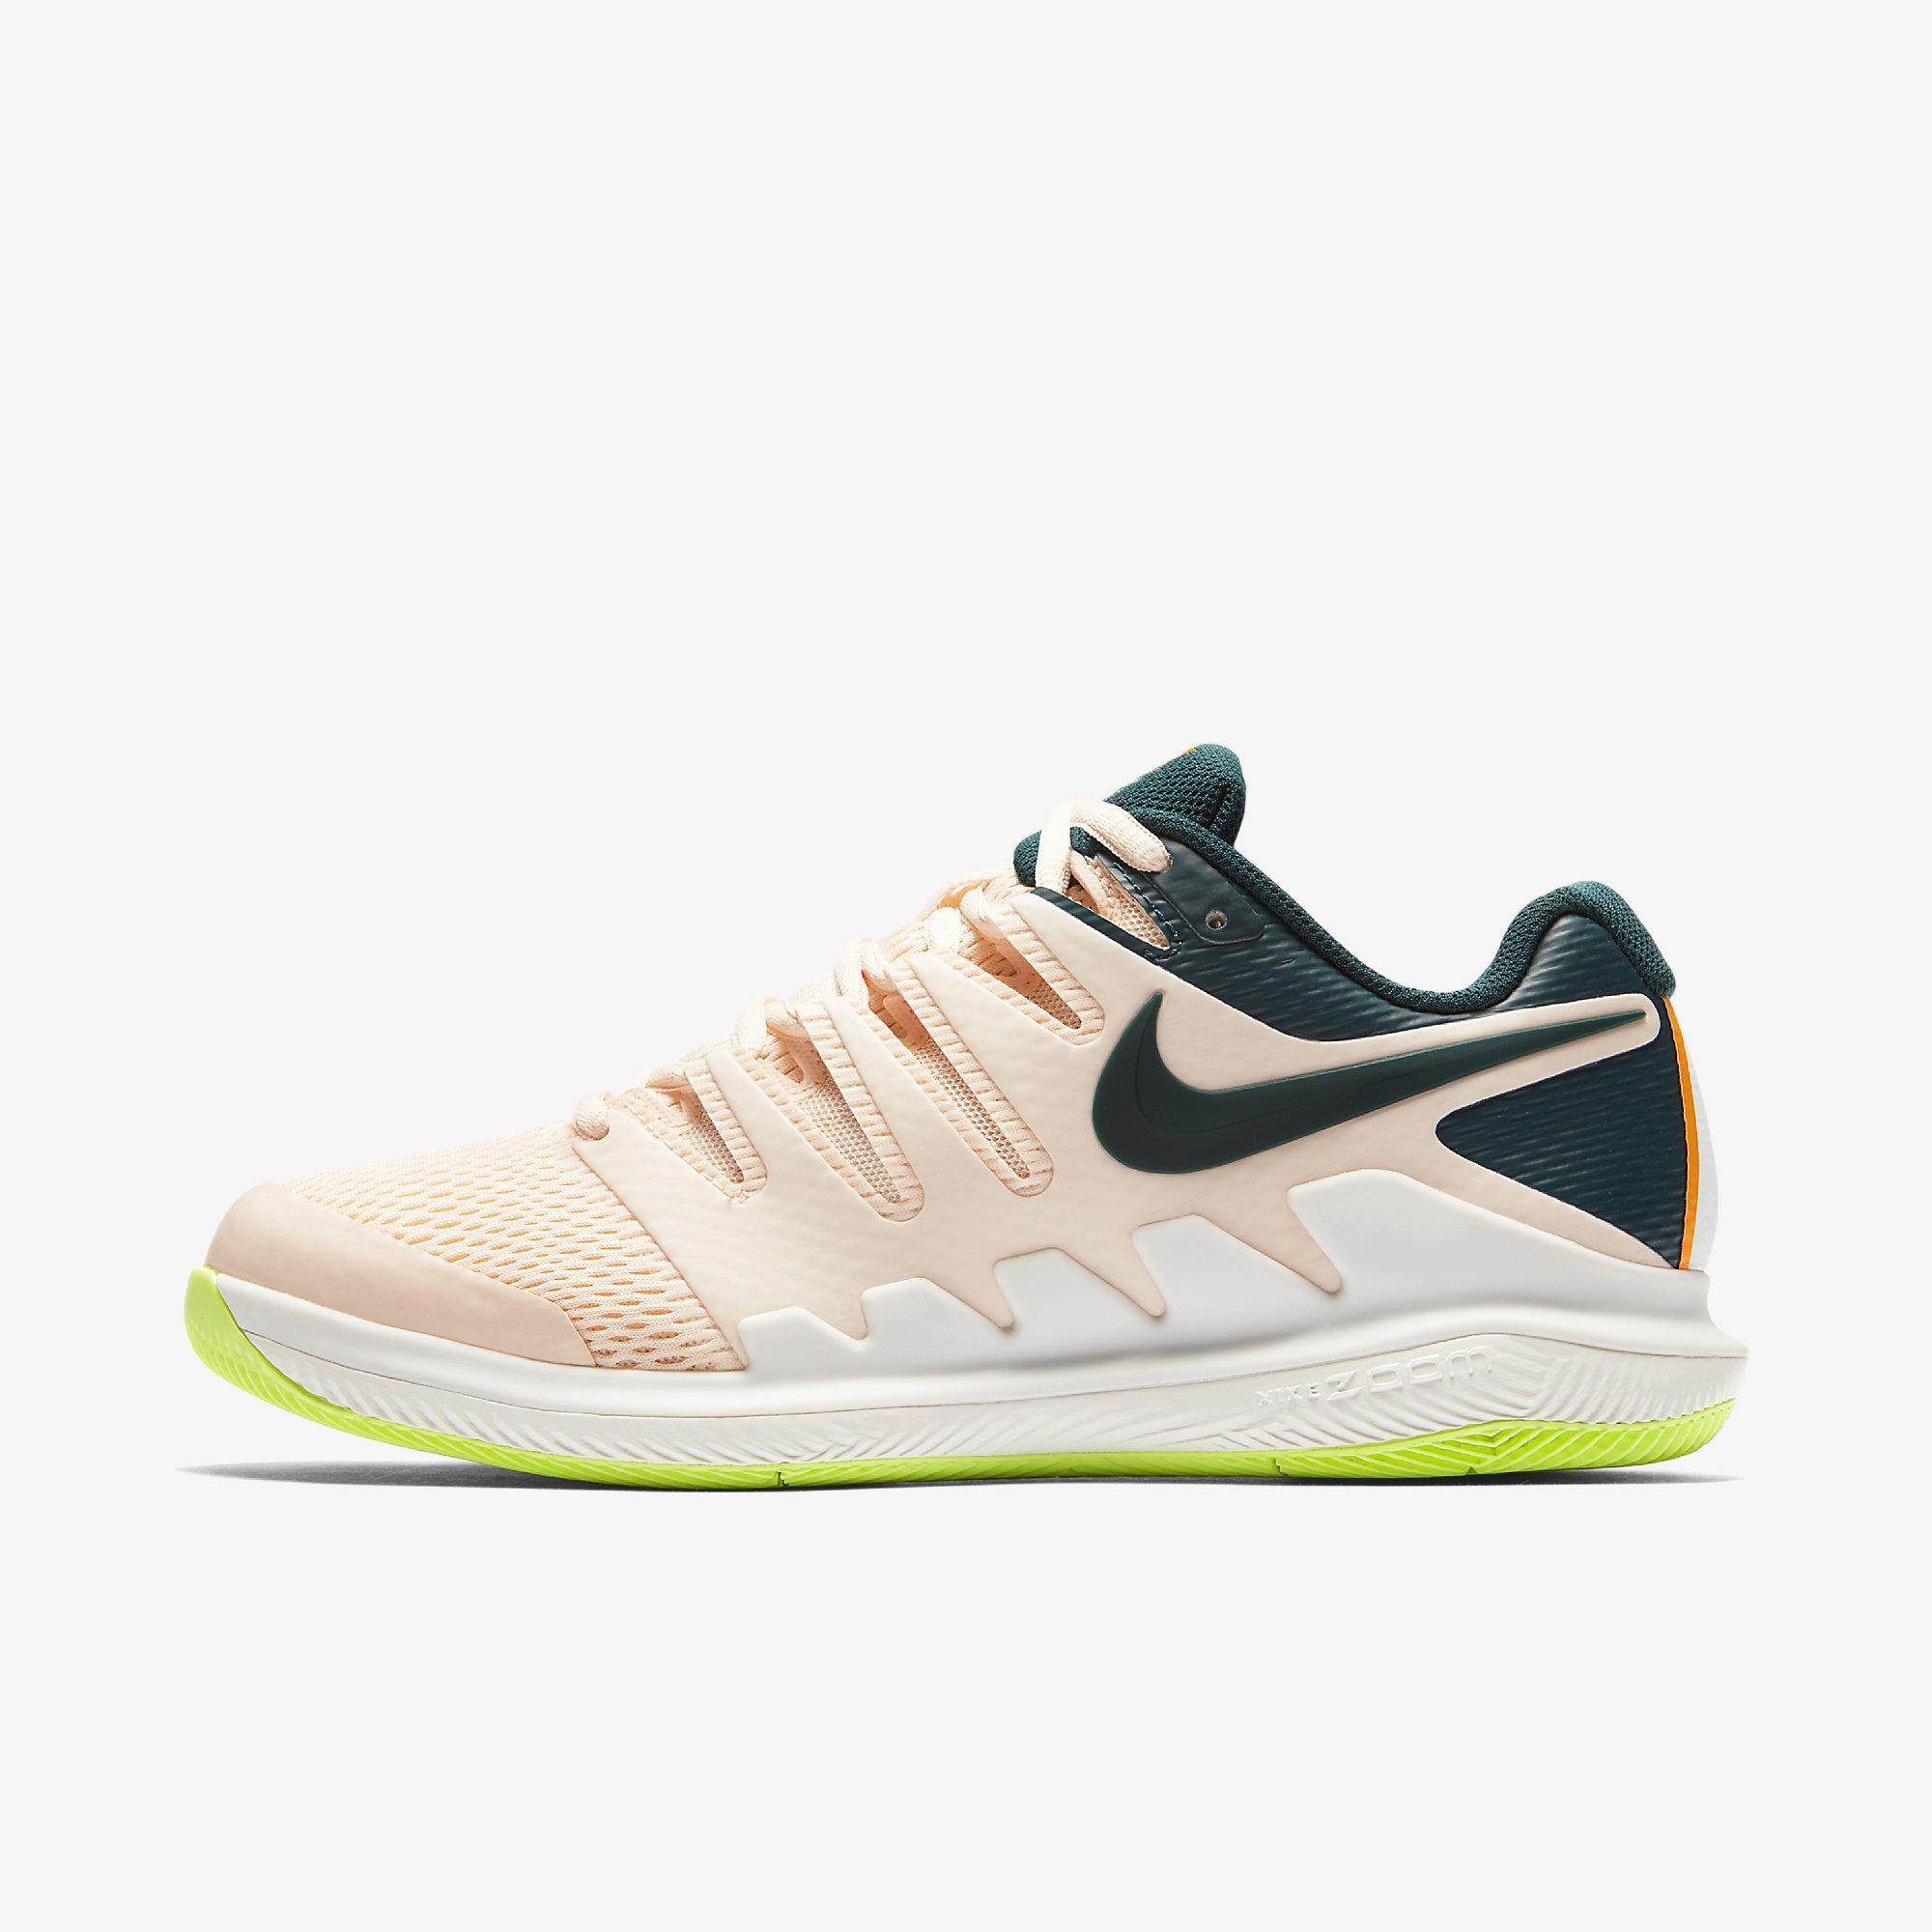 size 40 7e6f3 10f4c Nike Womens Air Zoom Vapor X Tennis Shoes - Guava Ice Midnight Spruce -  Tennisnuts.com